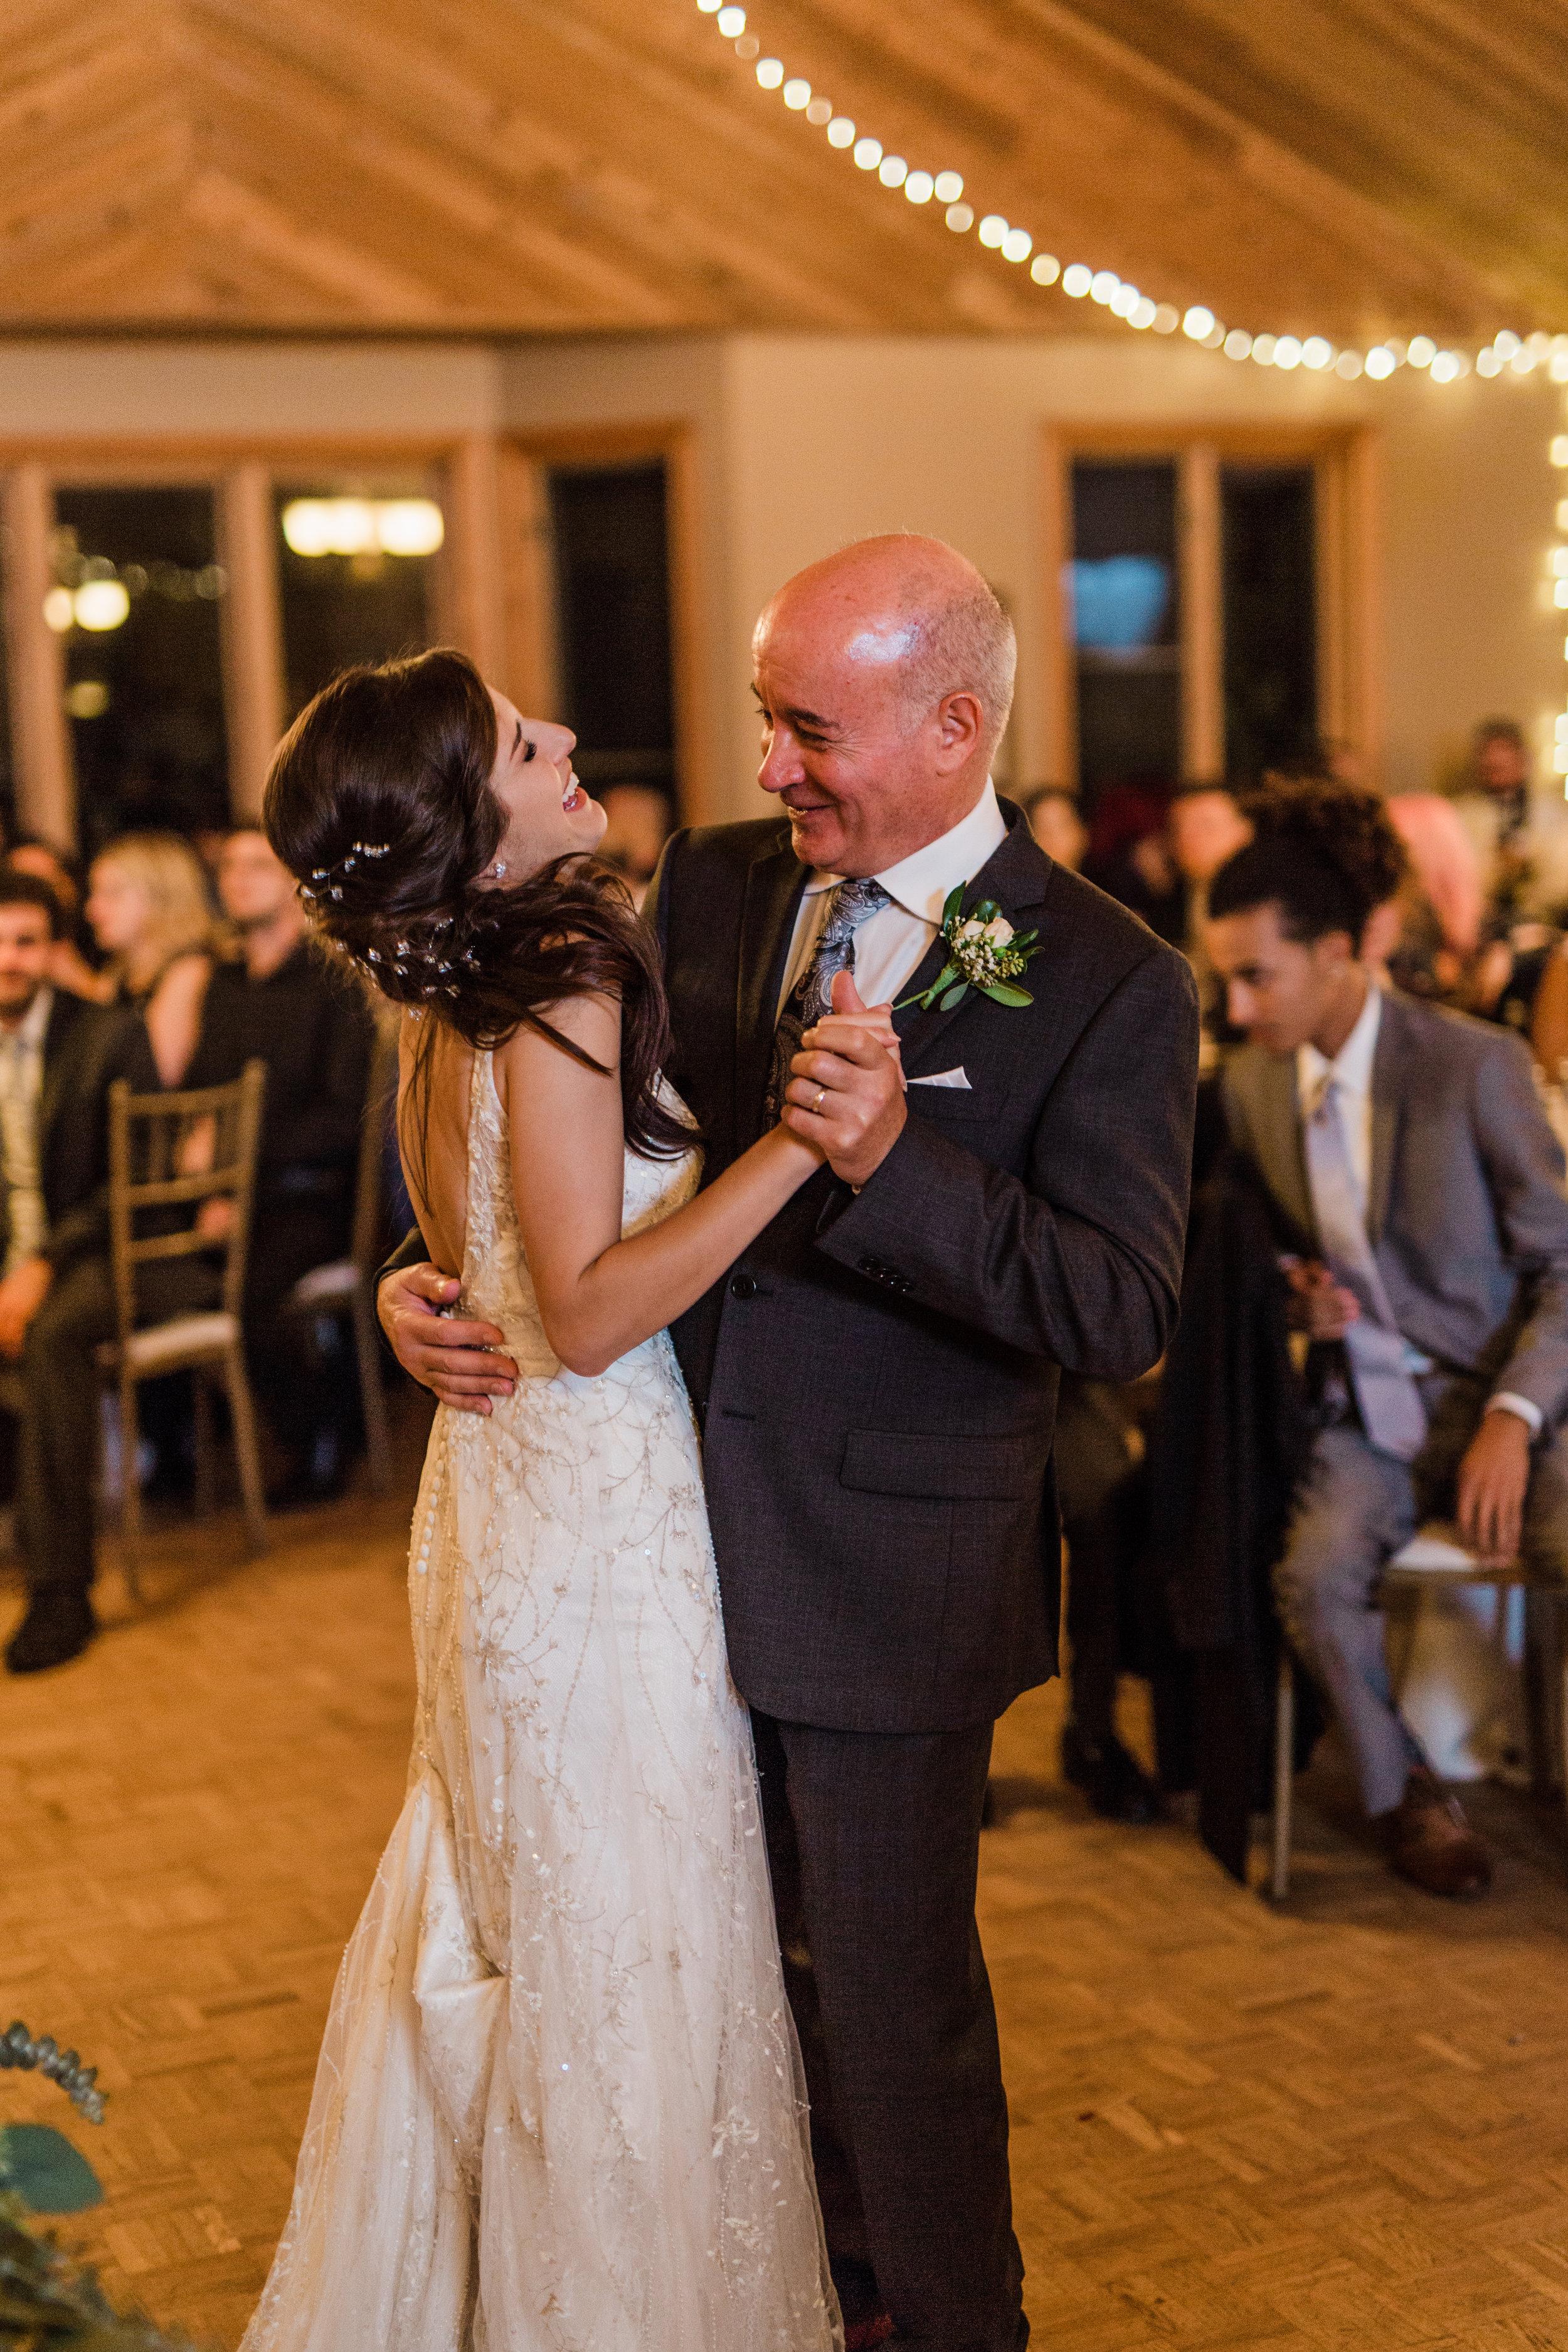 Amir-Golbazi-Danielle-Giroux-Photography_Toronto-Wedding_Cedarwood_Rachel-Paul_728.jpg